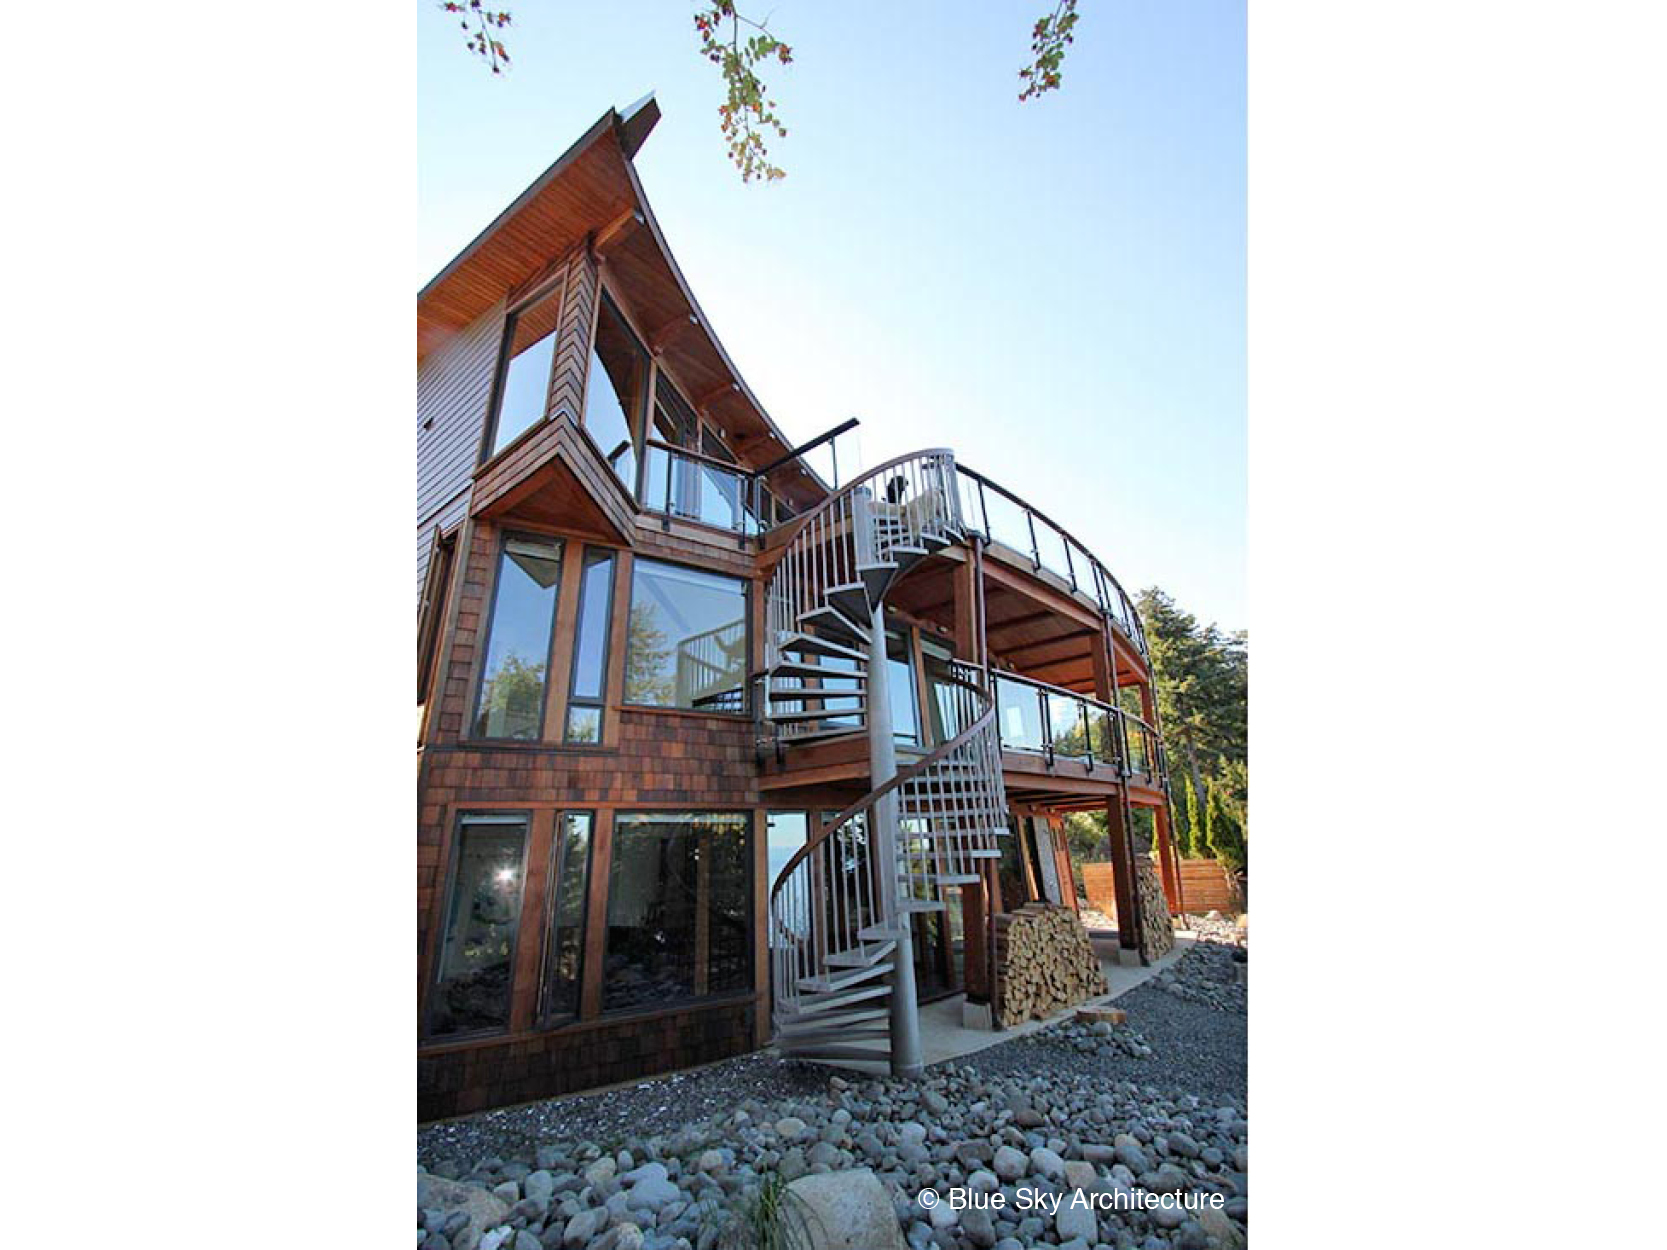 cove-house-terrace-spiral-staircase.jpg